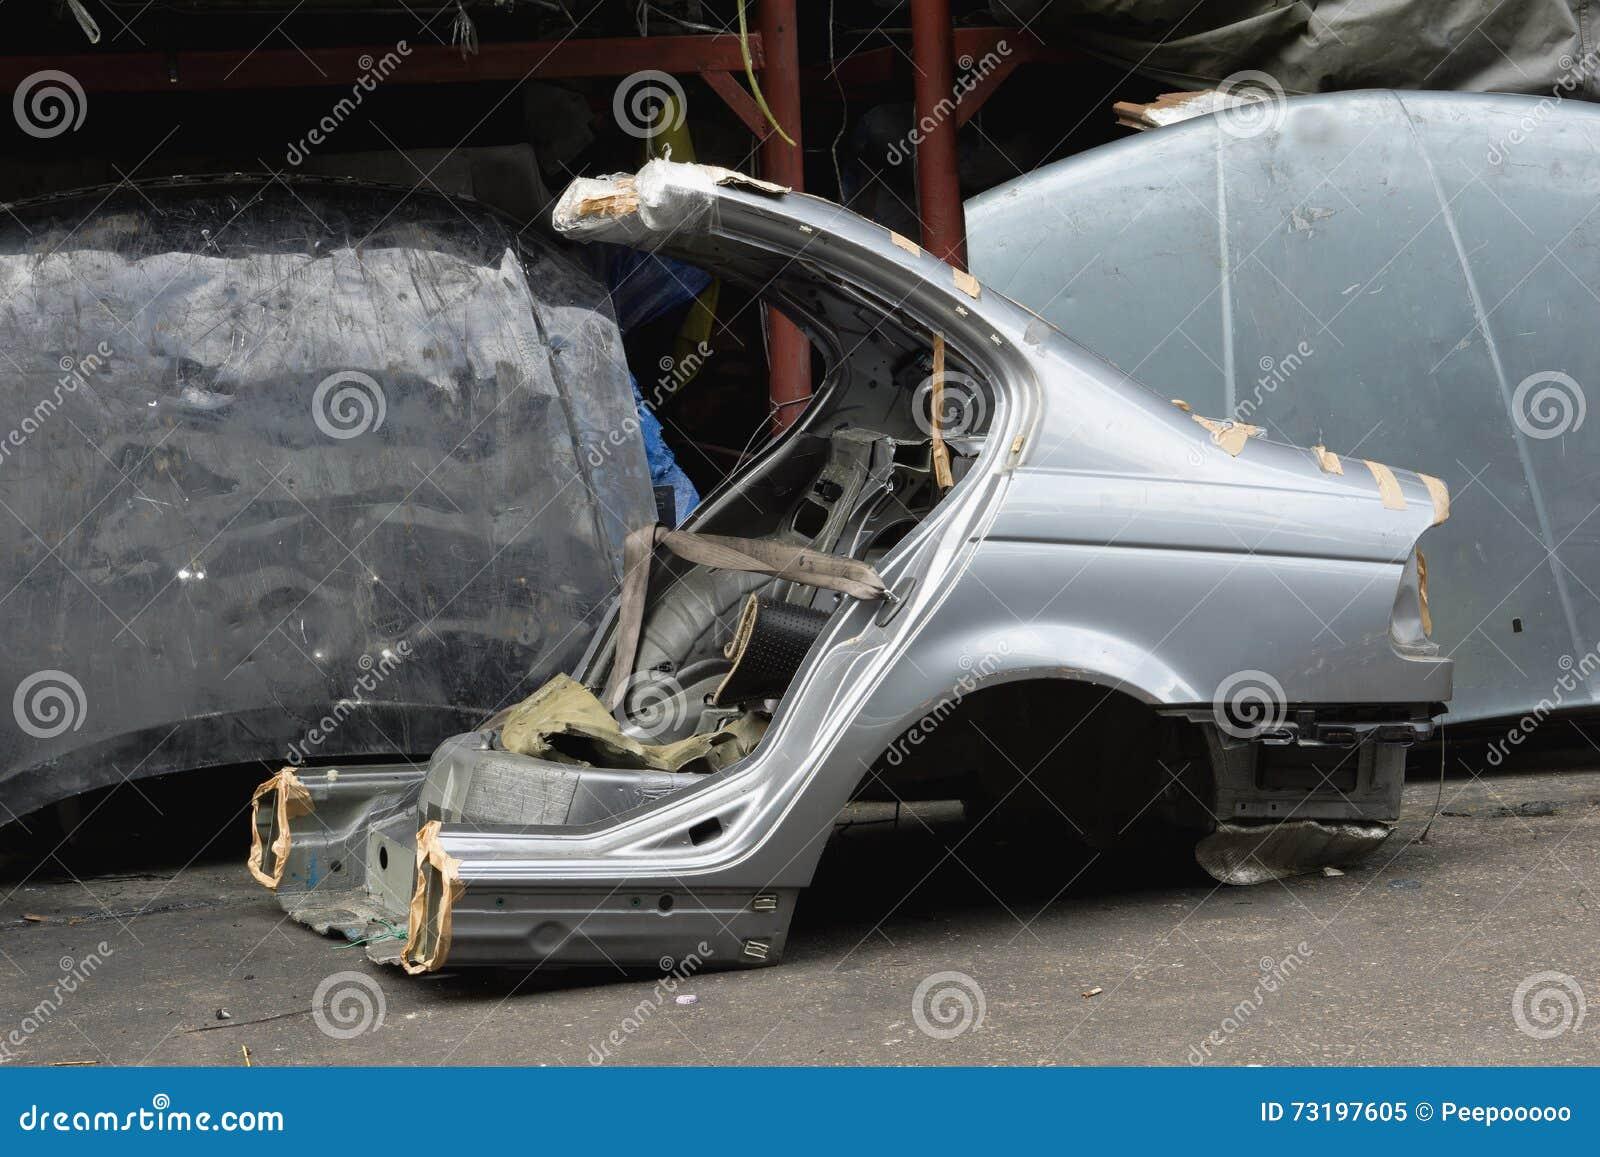 Cut used car body stock image. Image of garage, mechanic - 73197605